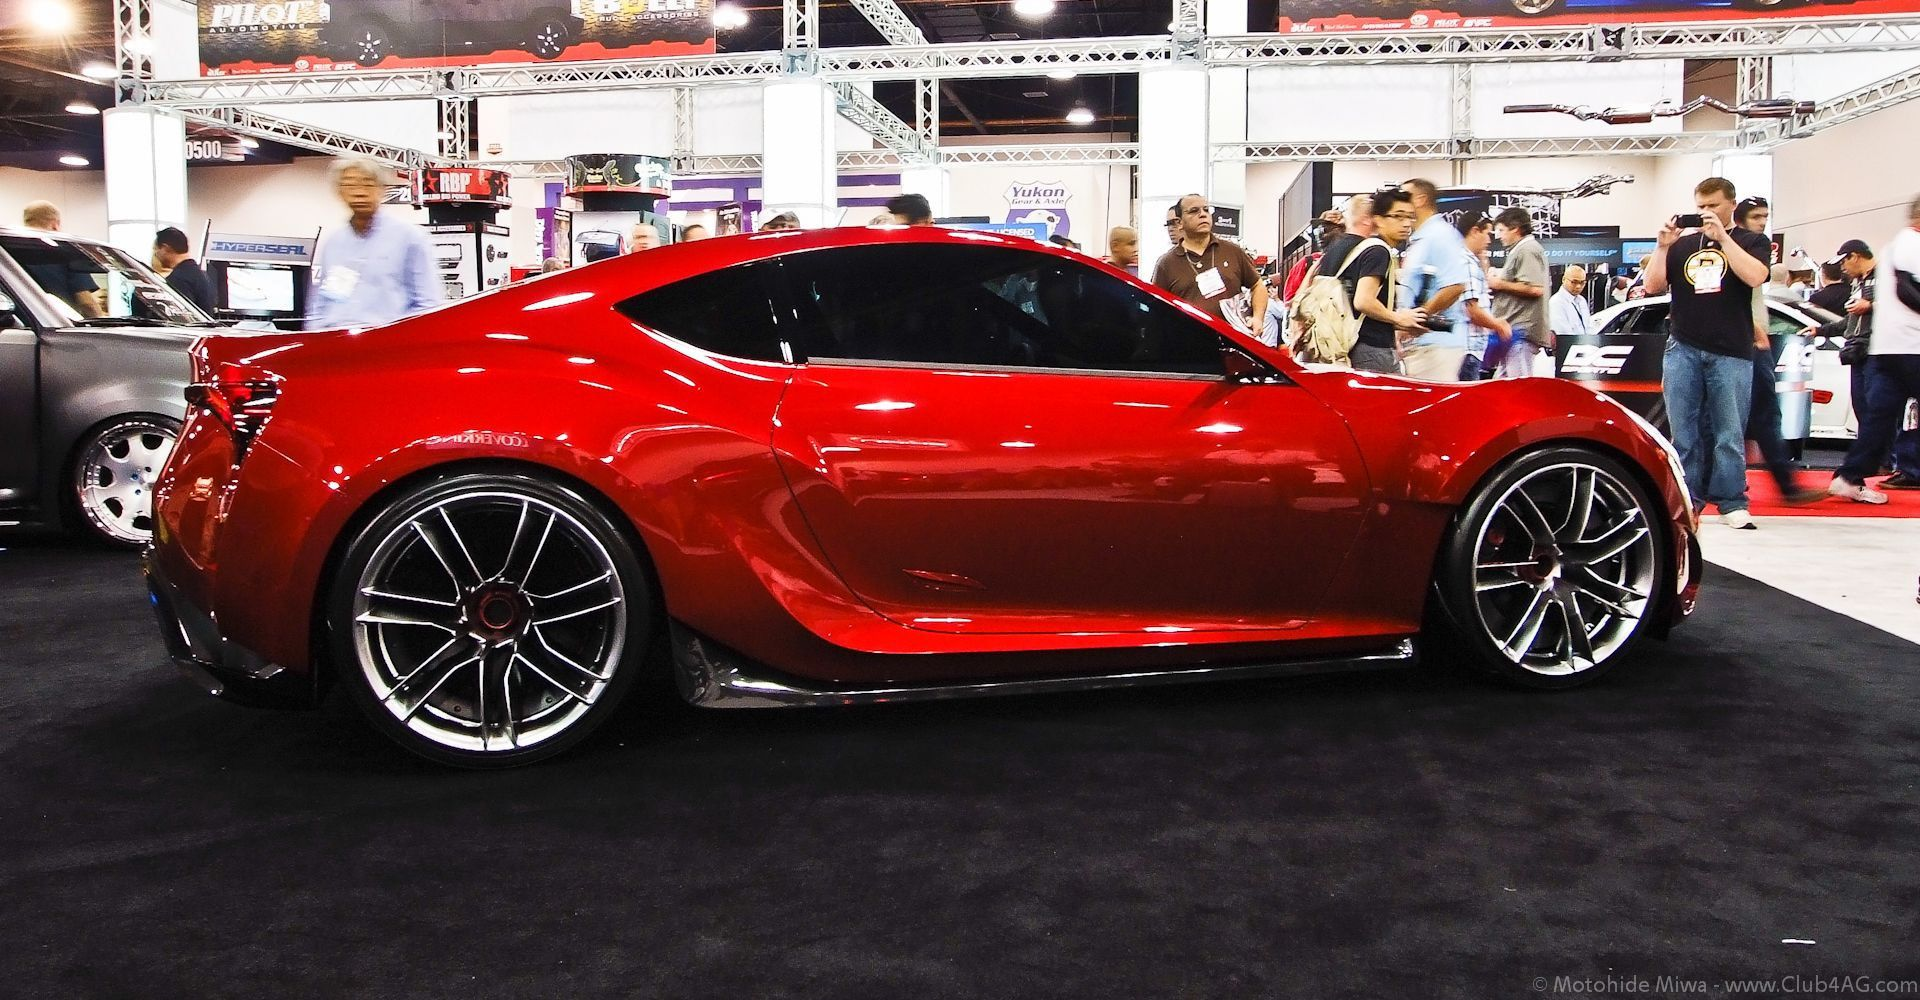 2020 Scion FR-S Sedan New Concept